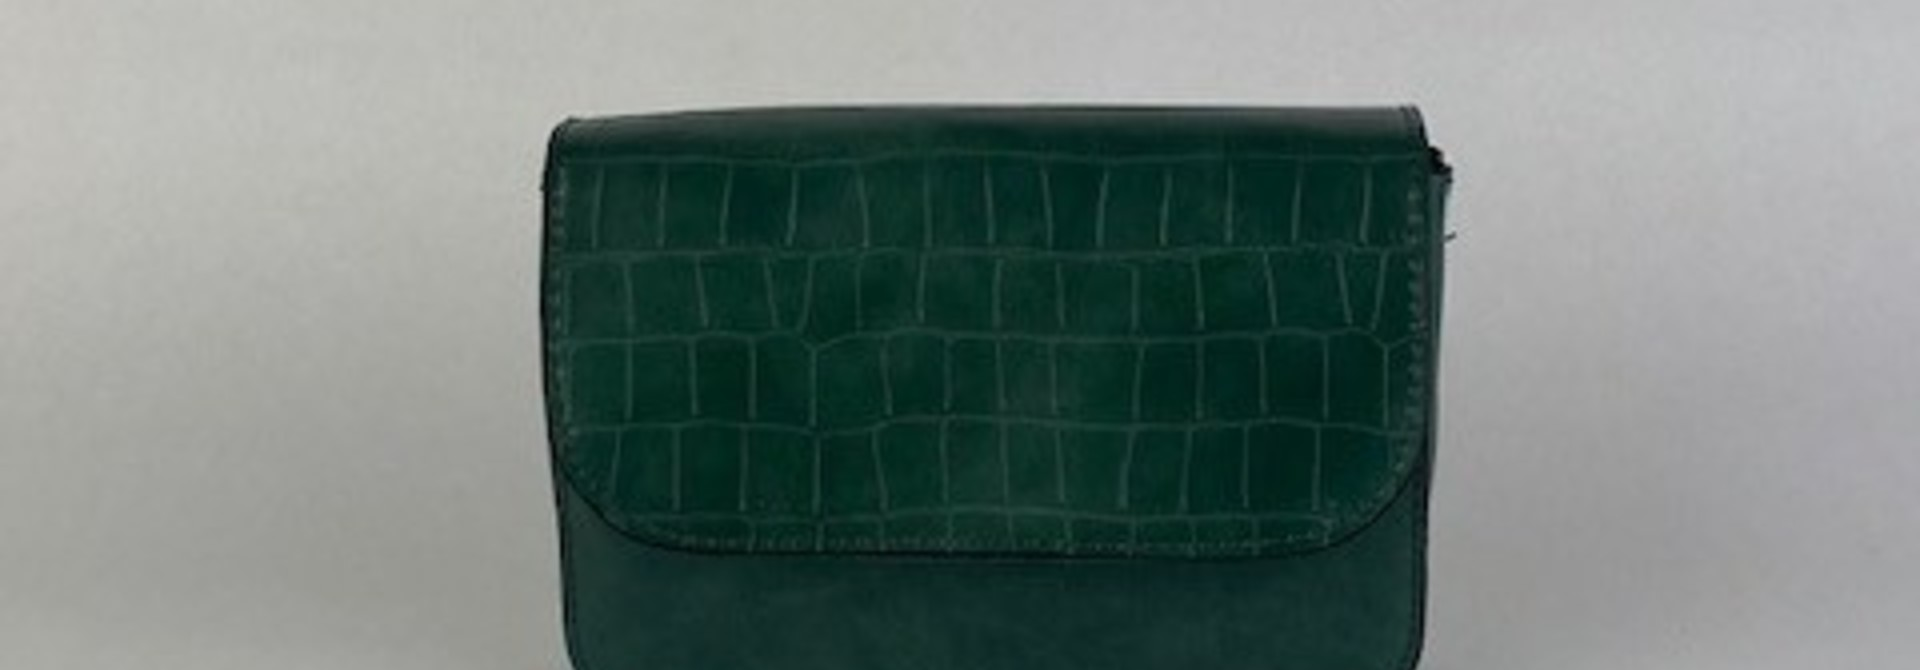 Hailey croco bag Ash Green